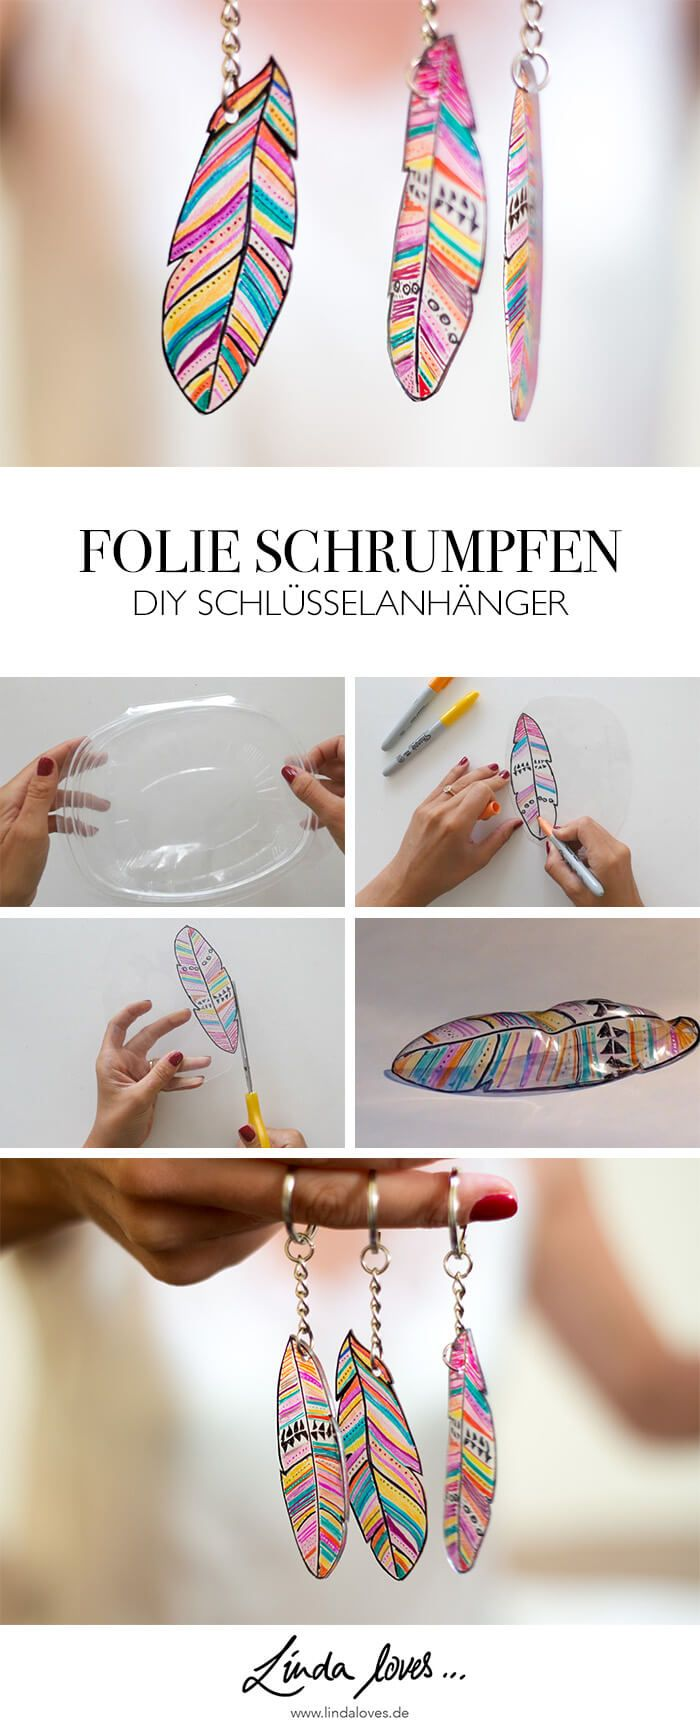 DIY SCHRUMPFFOLIE ANHÄNGER AUS PLASTIKVERPACKUNG | Schlüsselanhänger ...